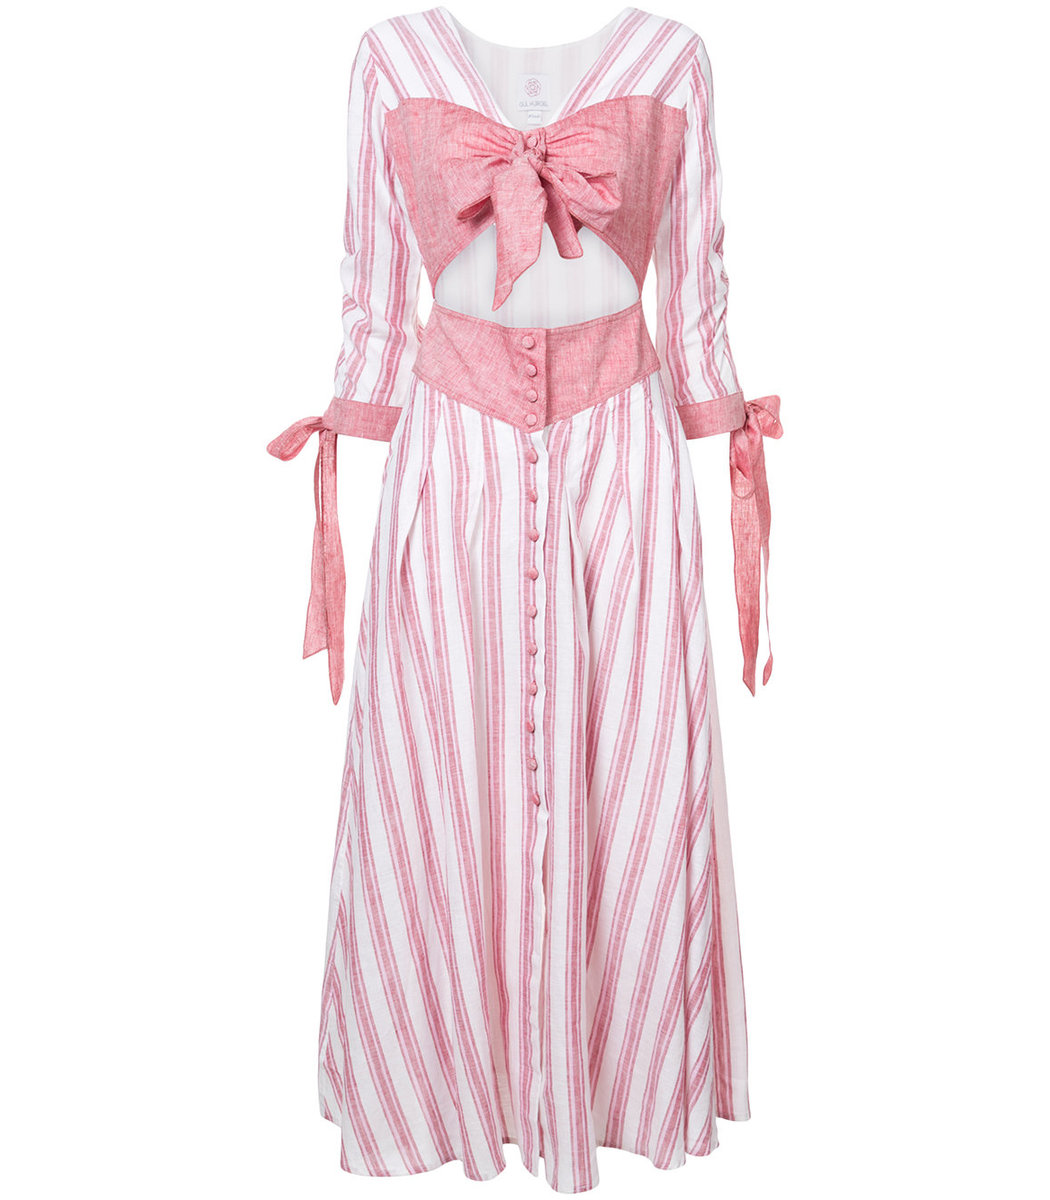 Gül Hürgel Pink/White Cut Out Detail Bow Dress